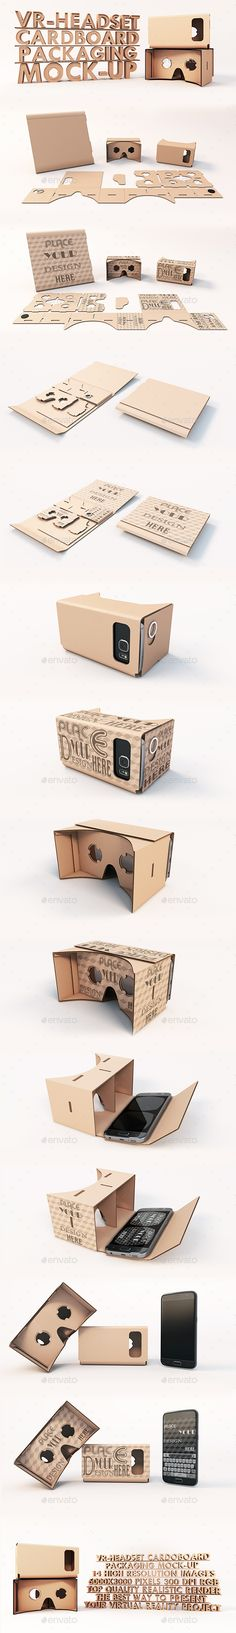 Virtual Reality Headset Cardboard Packaging Mock-ups - Product Mock-Ups Graphics